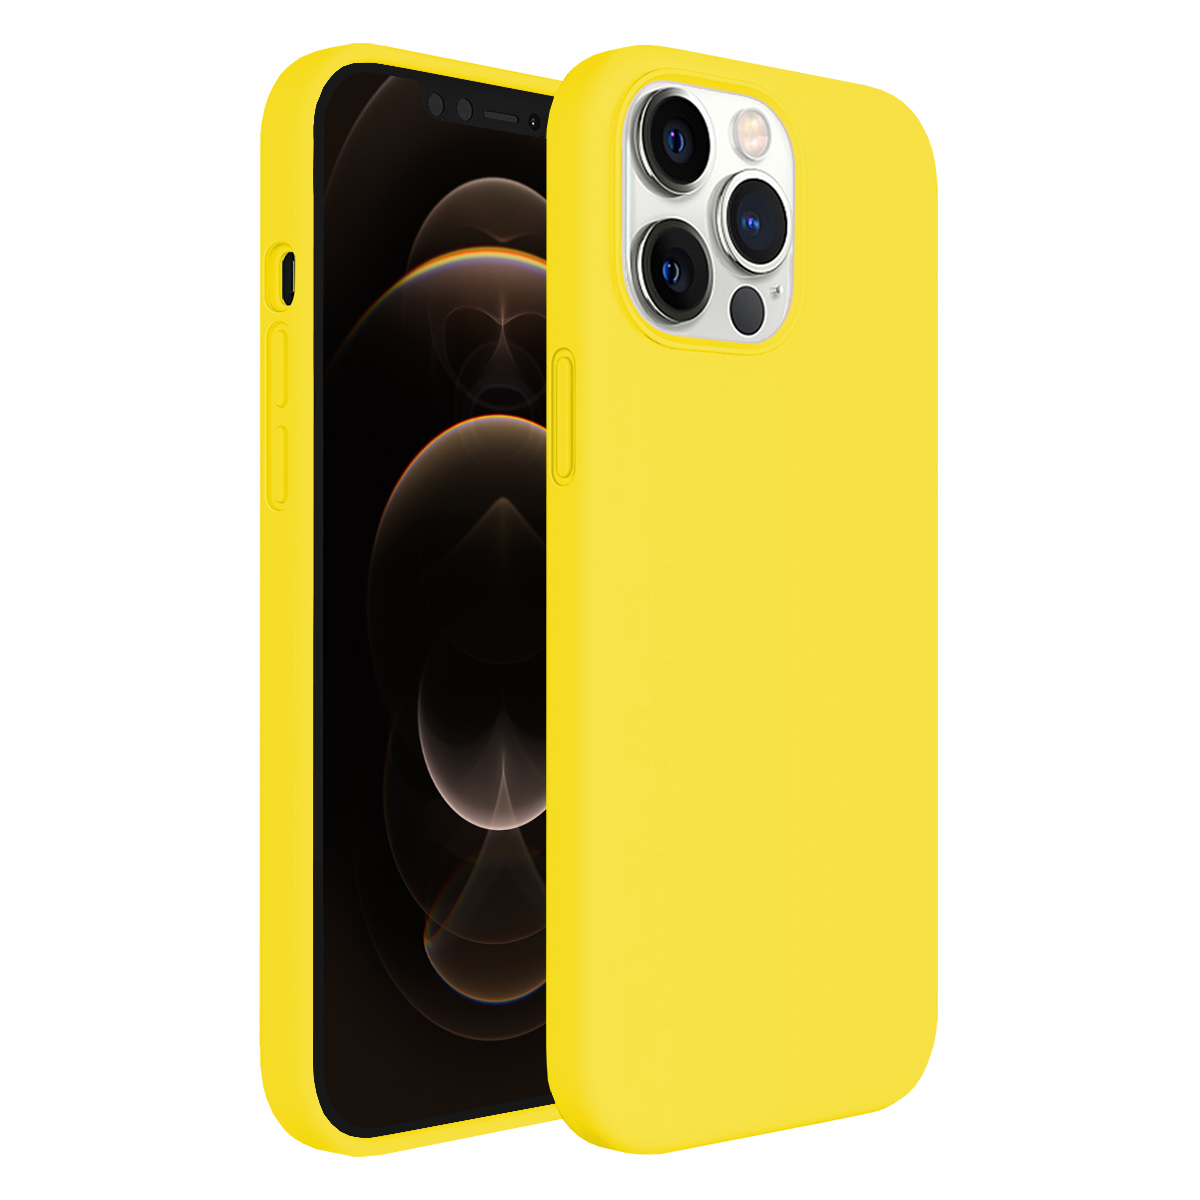 Buff iPhone 12 Pro Max Rubber S Kılıf Yellow